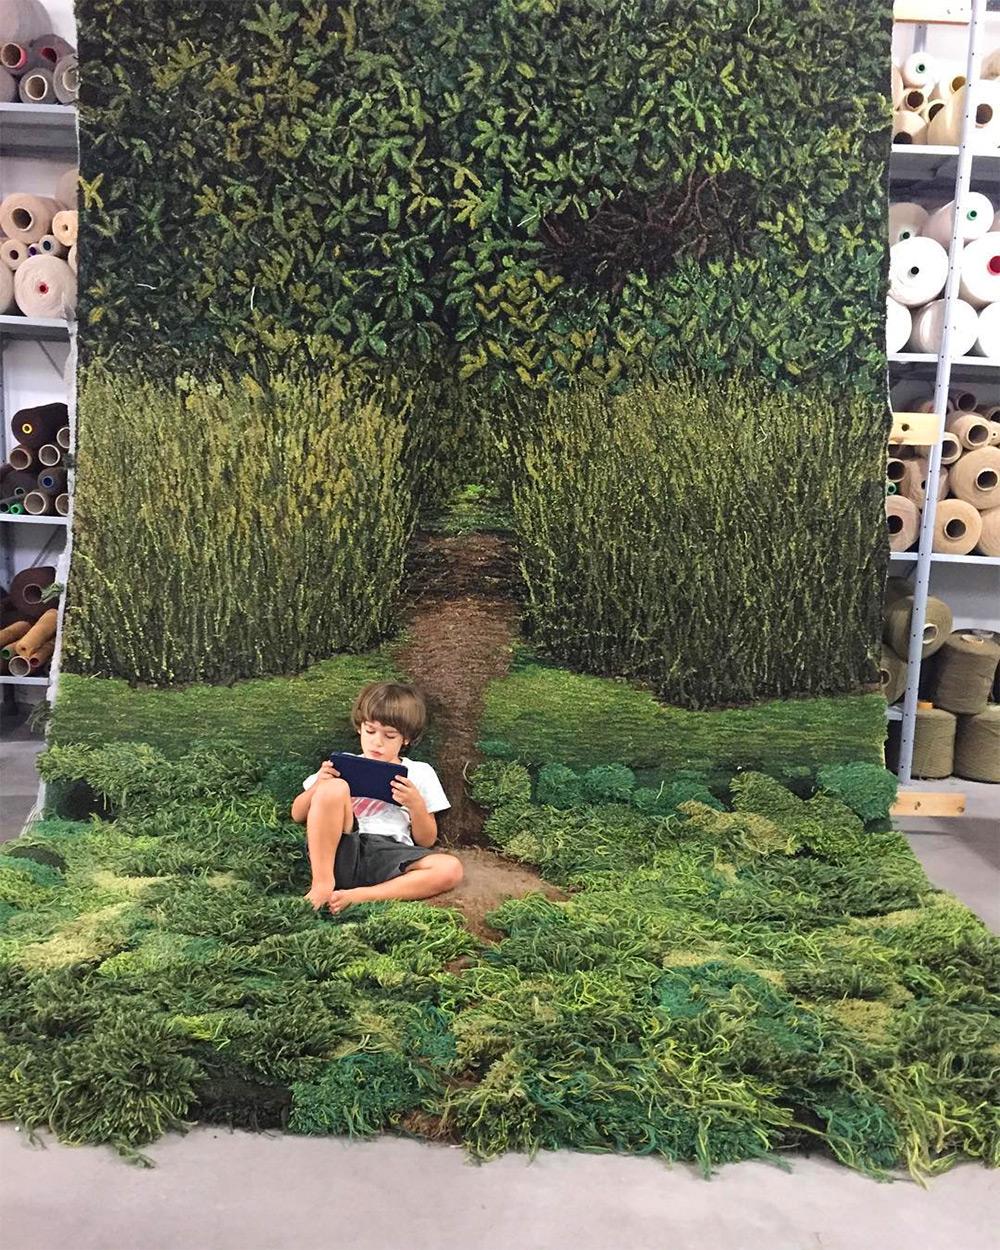 artista-cria-tapetes-inspirados-na-natureza-blog-usenatureza